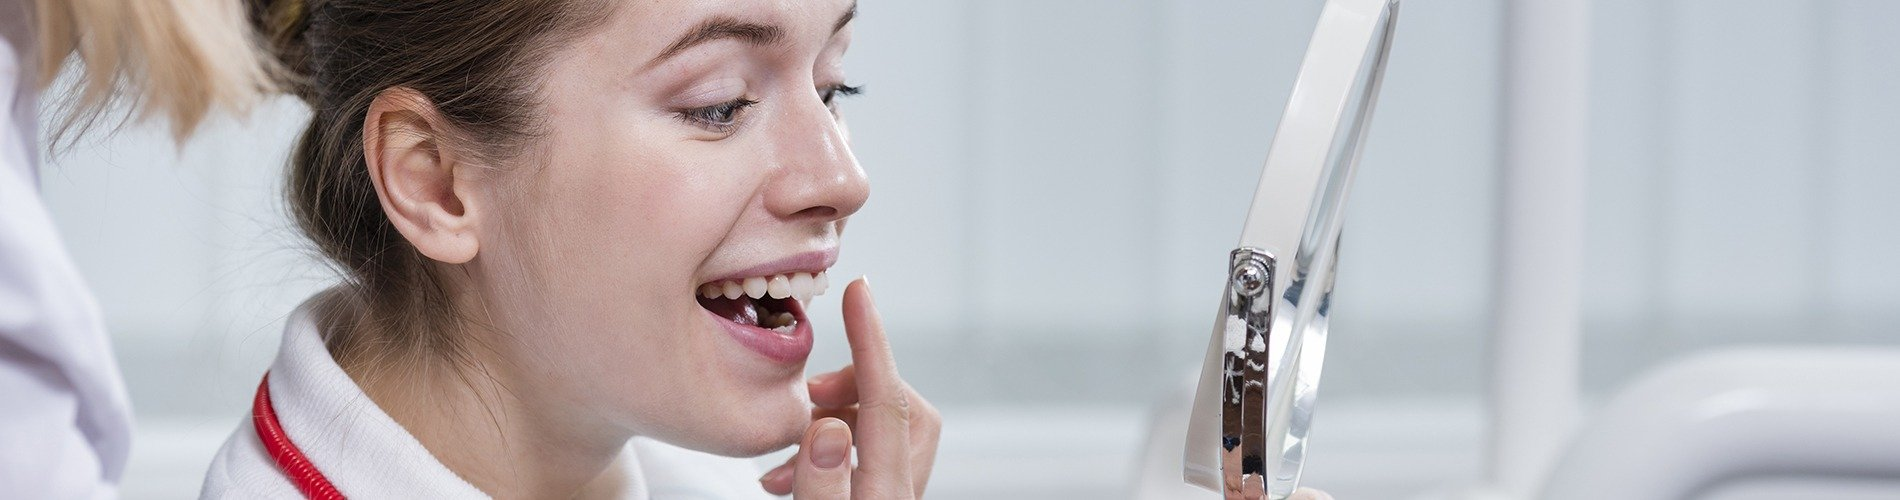 Composites y  la estética dental